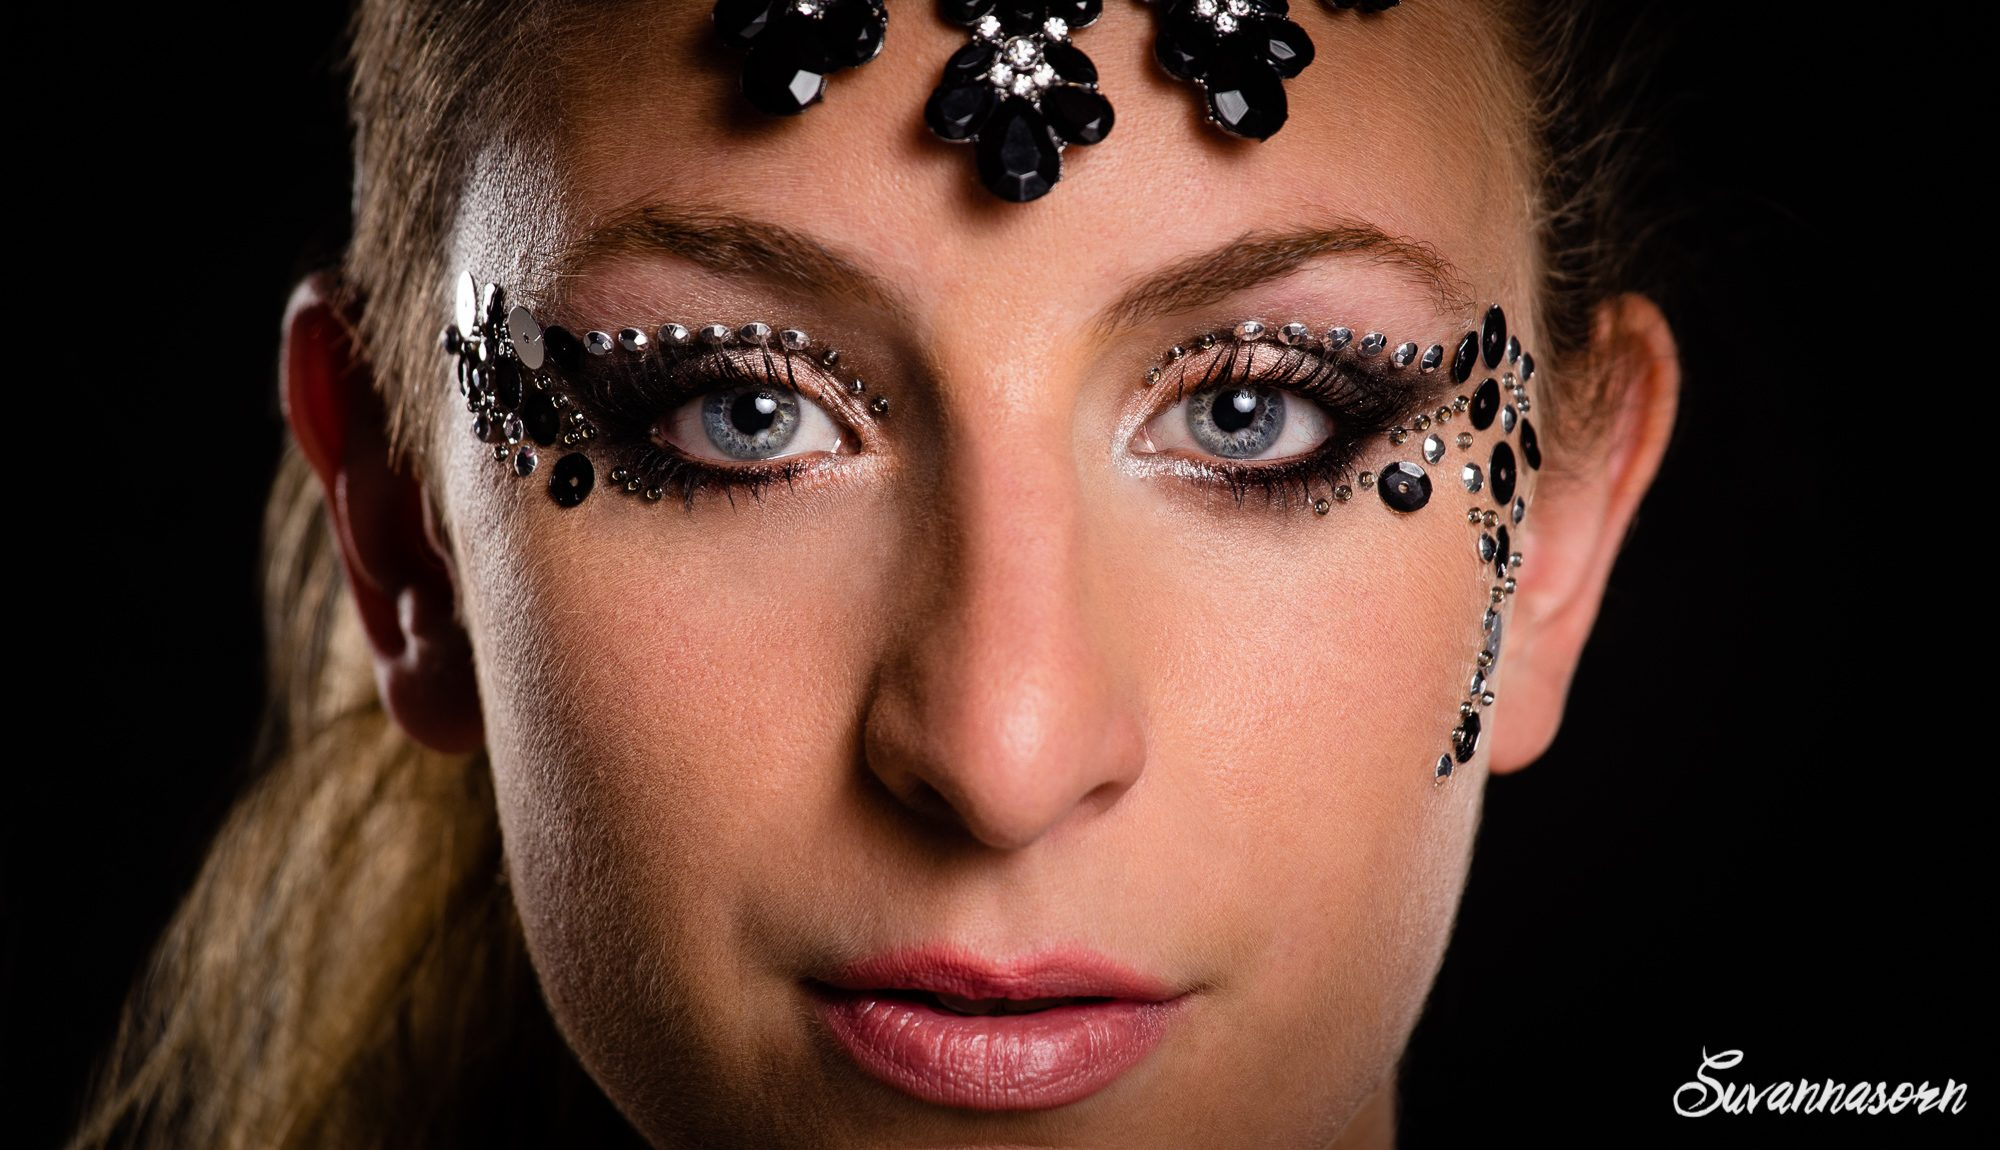 suvannasorn maquillage noir smoky eyes beauté femme genève maquilleuse artiste photographe